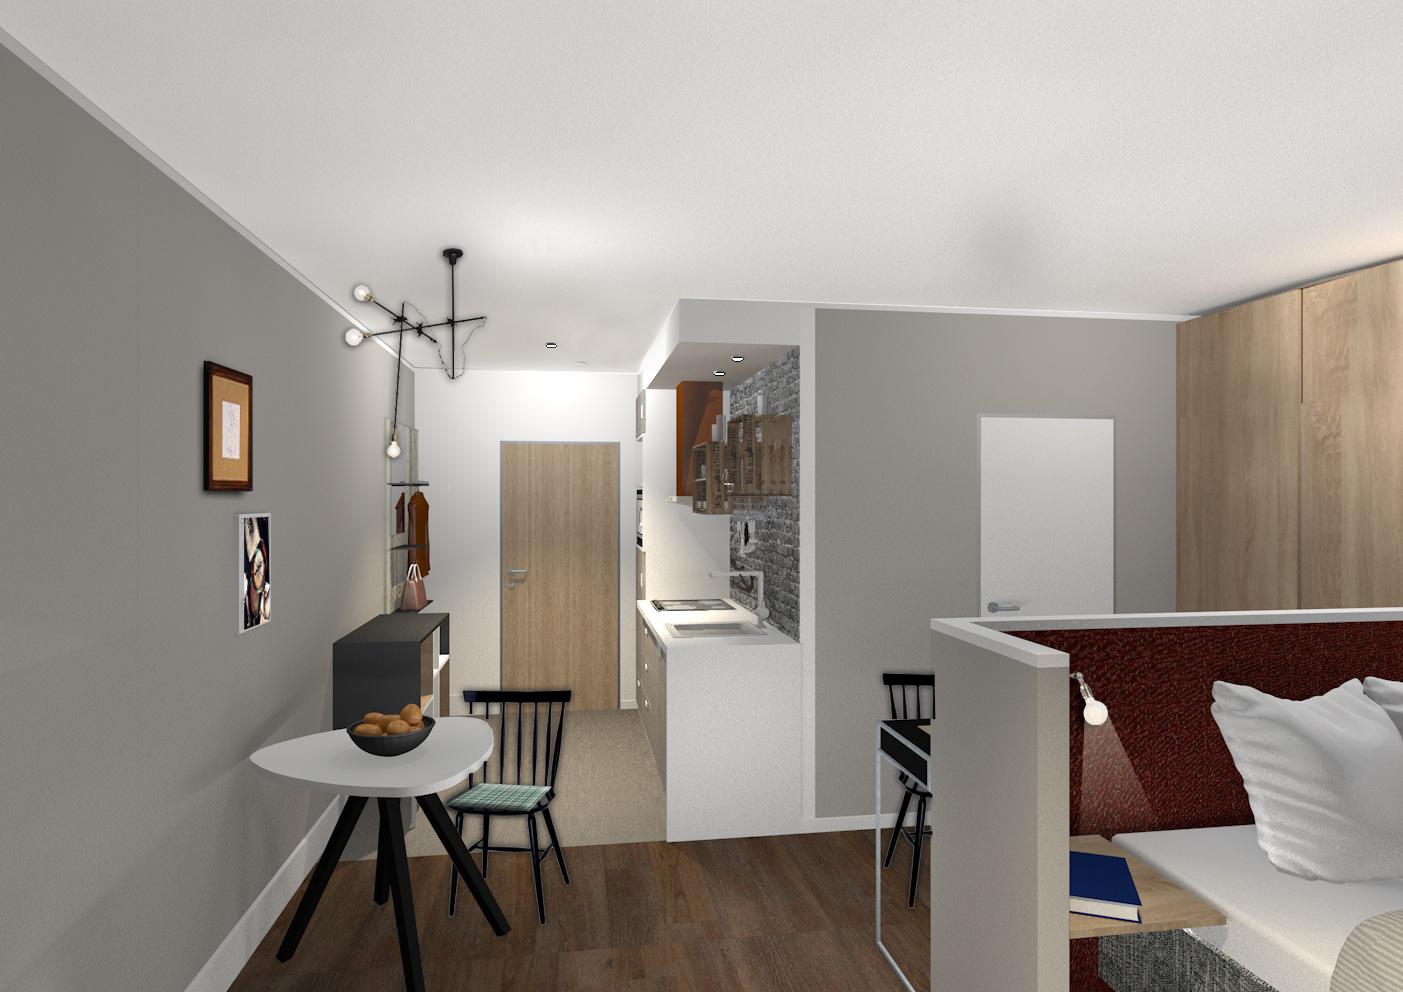 harbr hotel boardinghouse ist neuer heimathafen f r. Black Bedroom Furniture Sets. Home Design Ideas